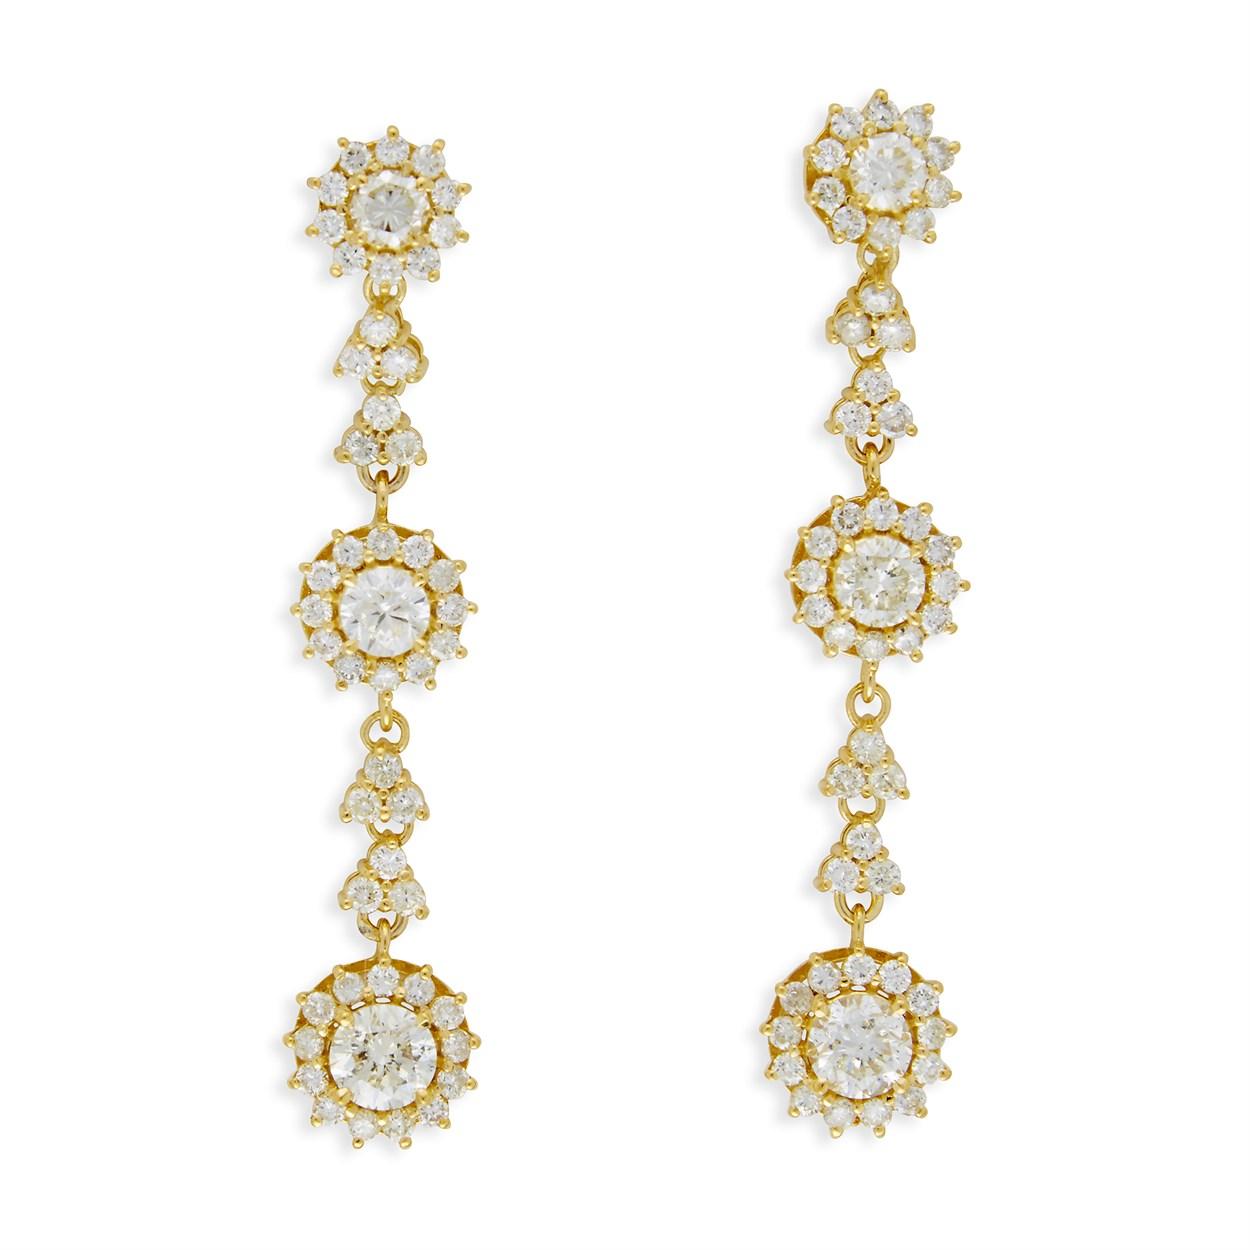 Lot 60 - A pair of diamond and eighteen karat gold pendant earrings